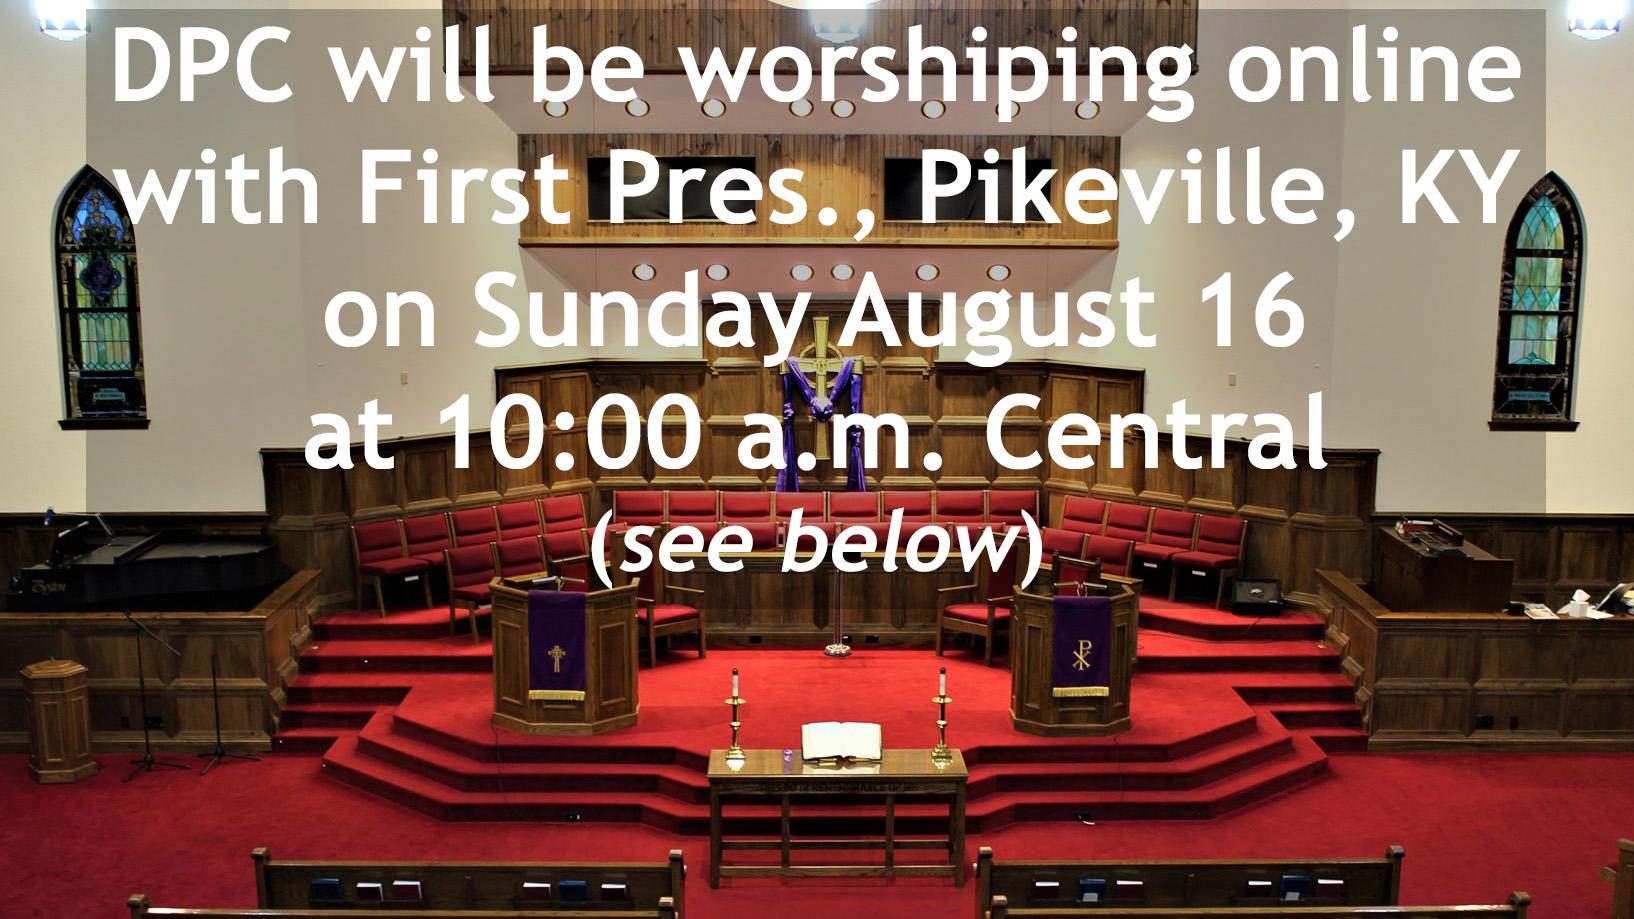 Pikeville worship slide, August 2020